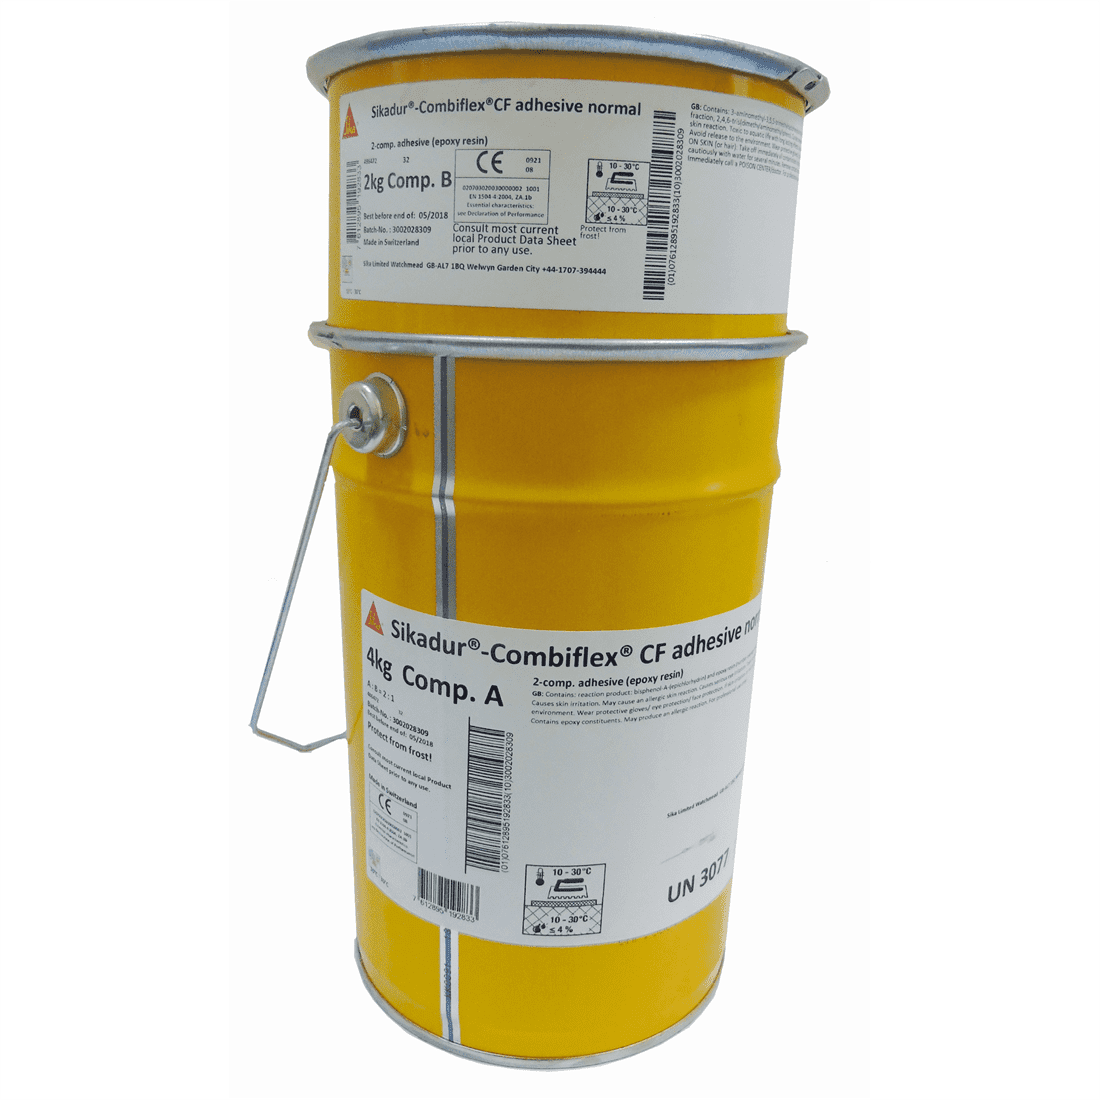 Sikadur Combiflex CF Adhesive Rapid (6kg)